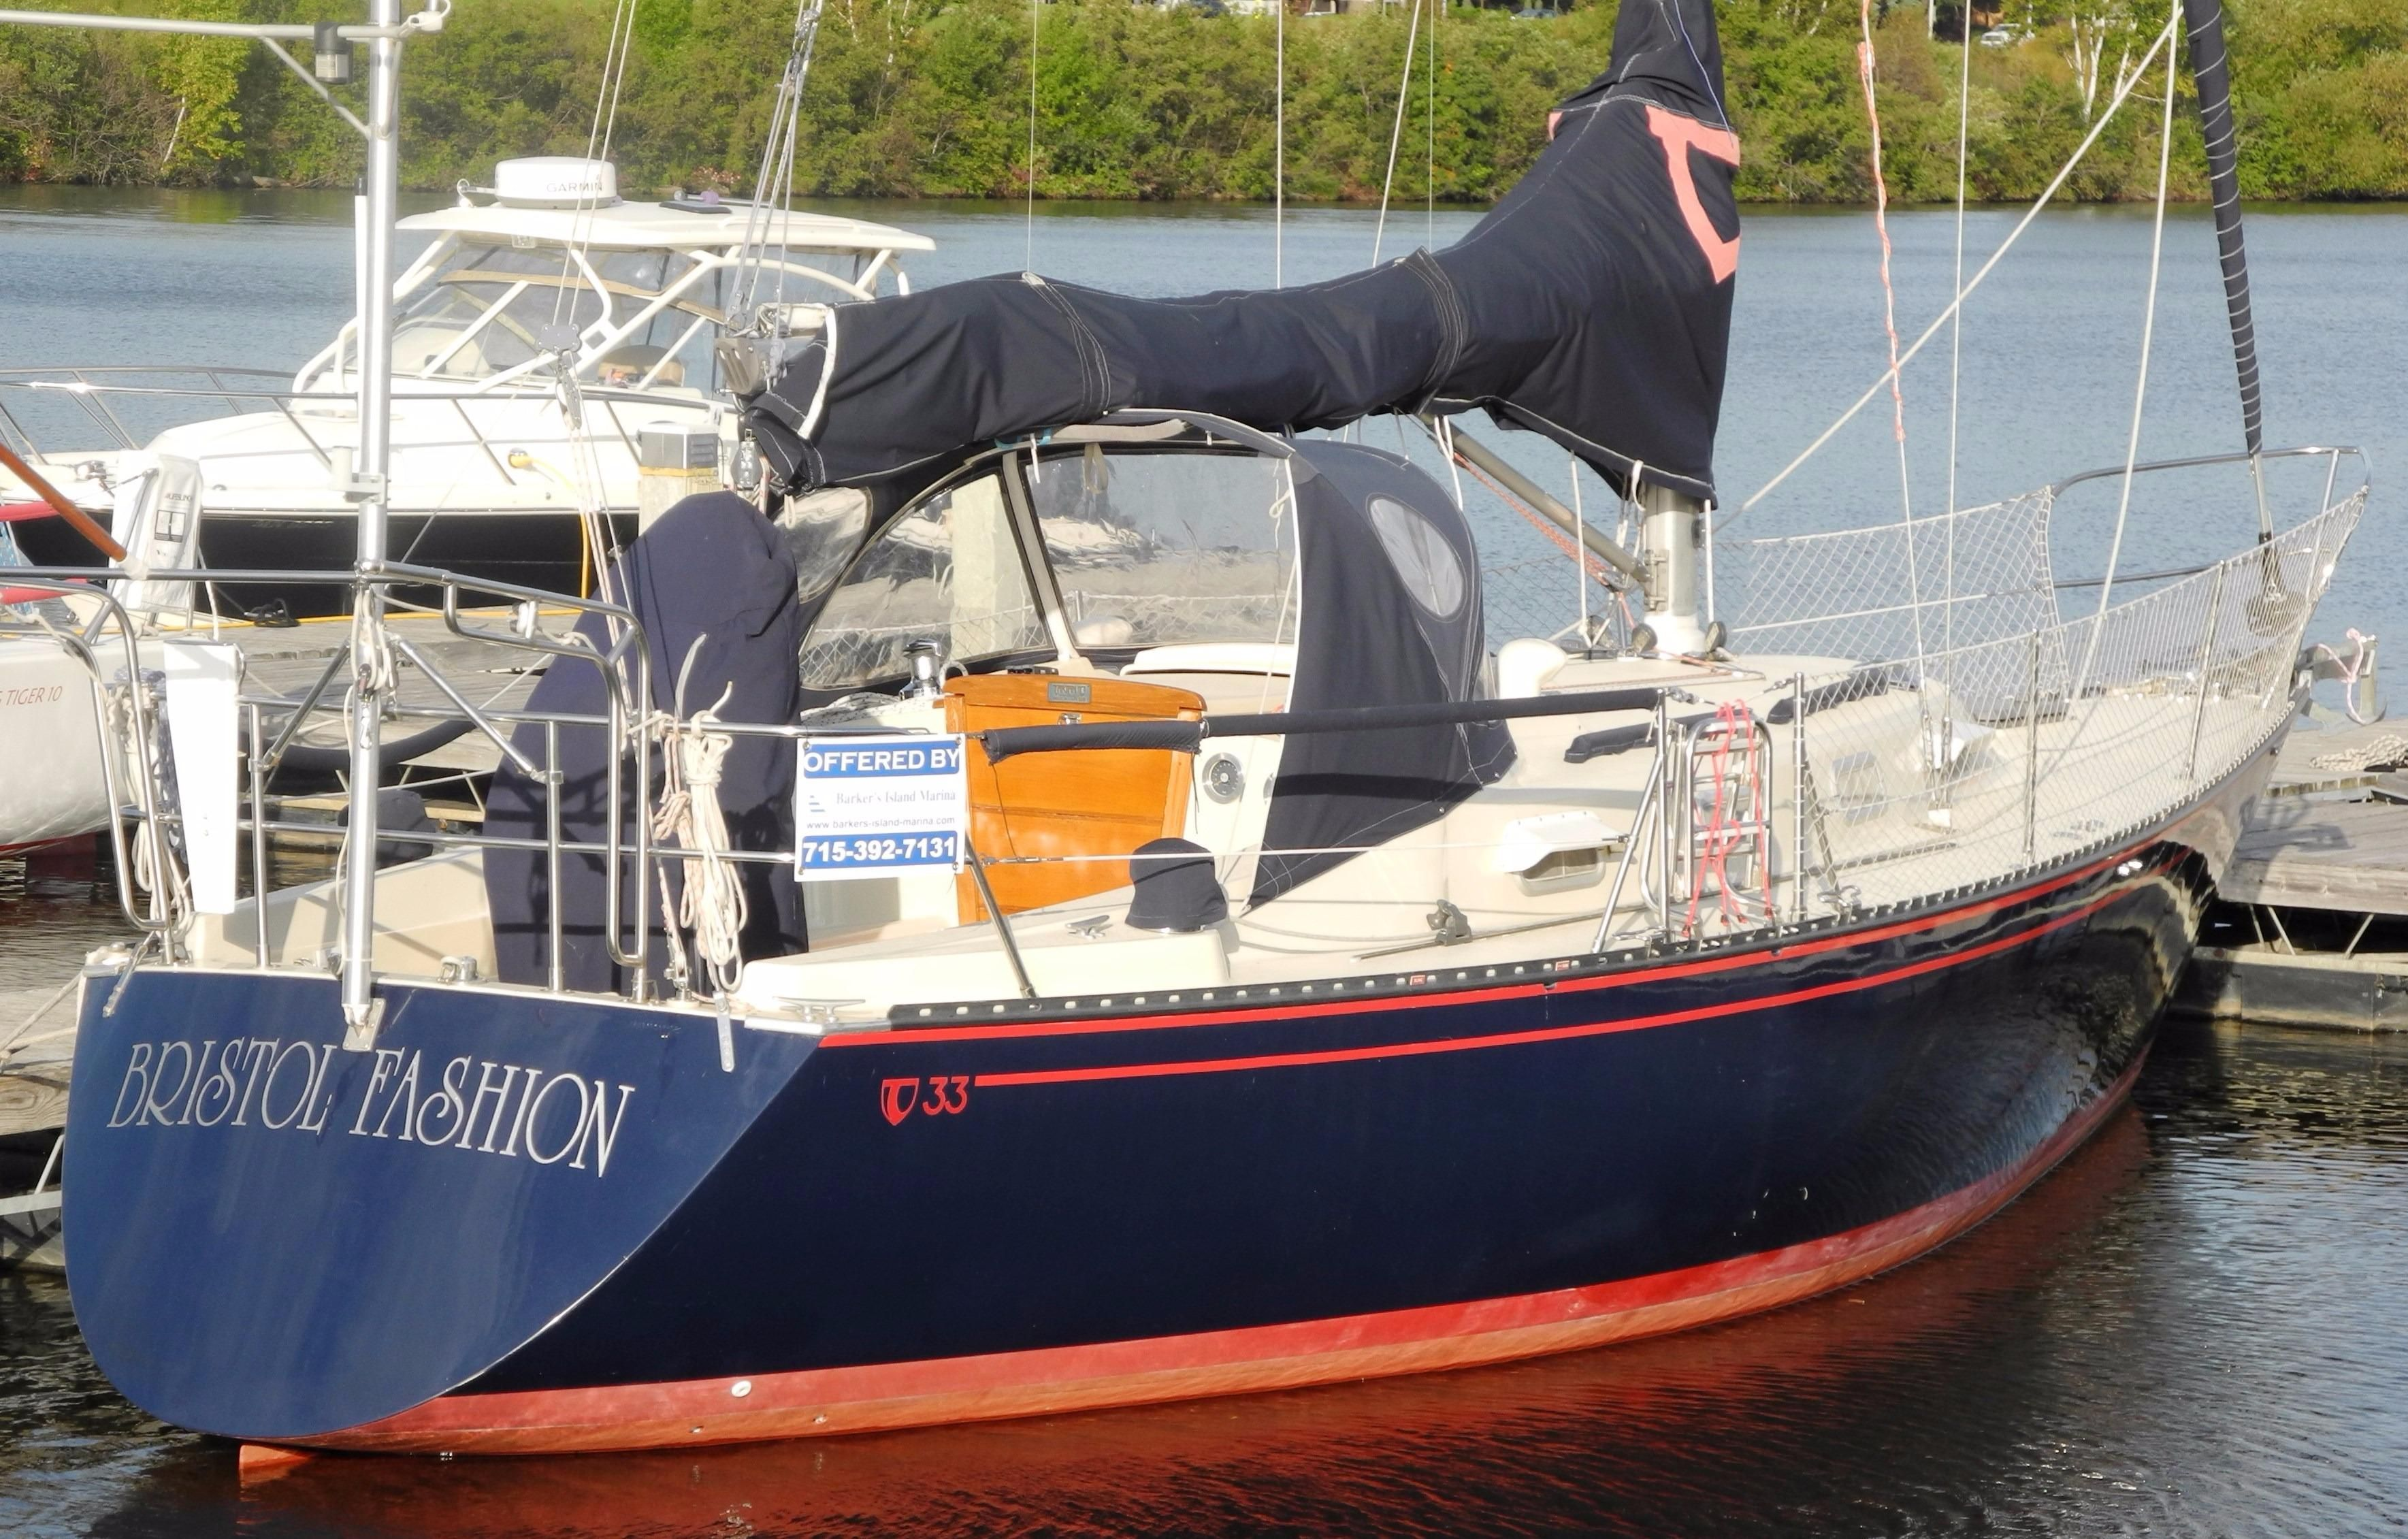 1986 Tartan Soverel 33 Sailboat Transport: 1980 Tartan 33 Sail Boat For Sale